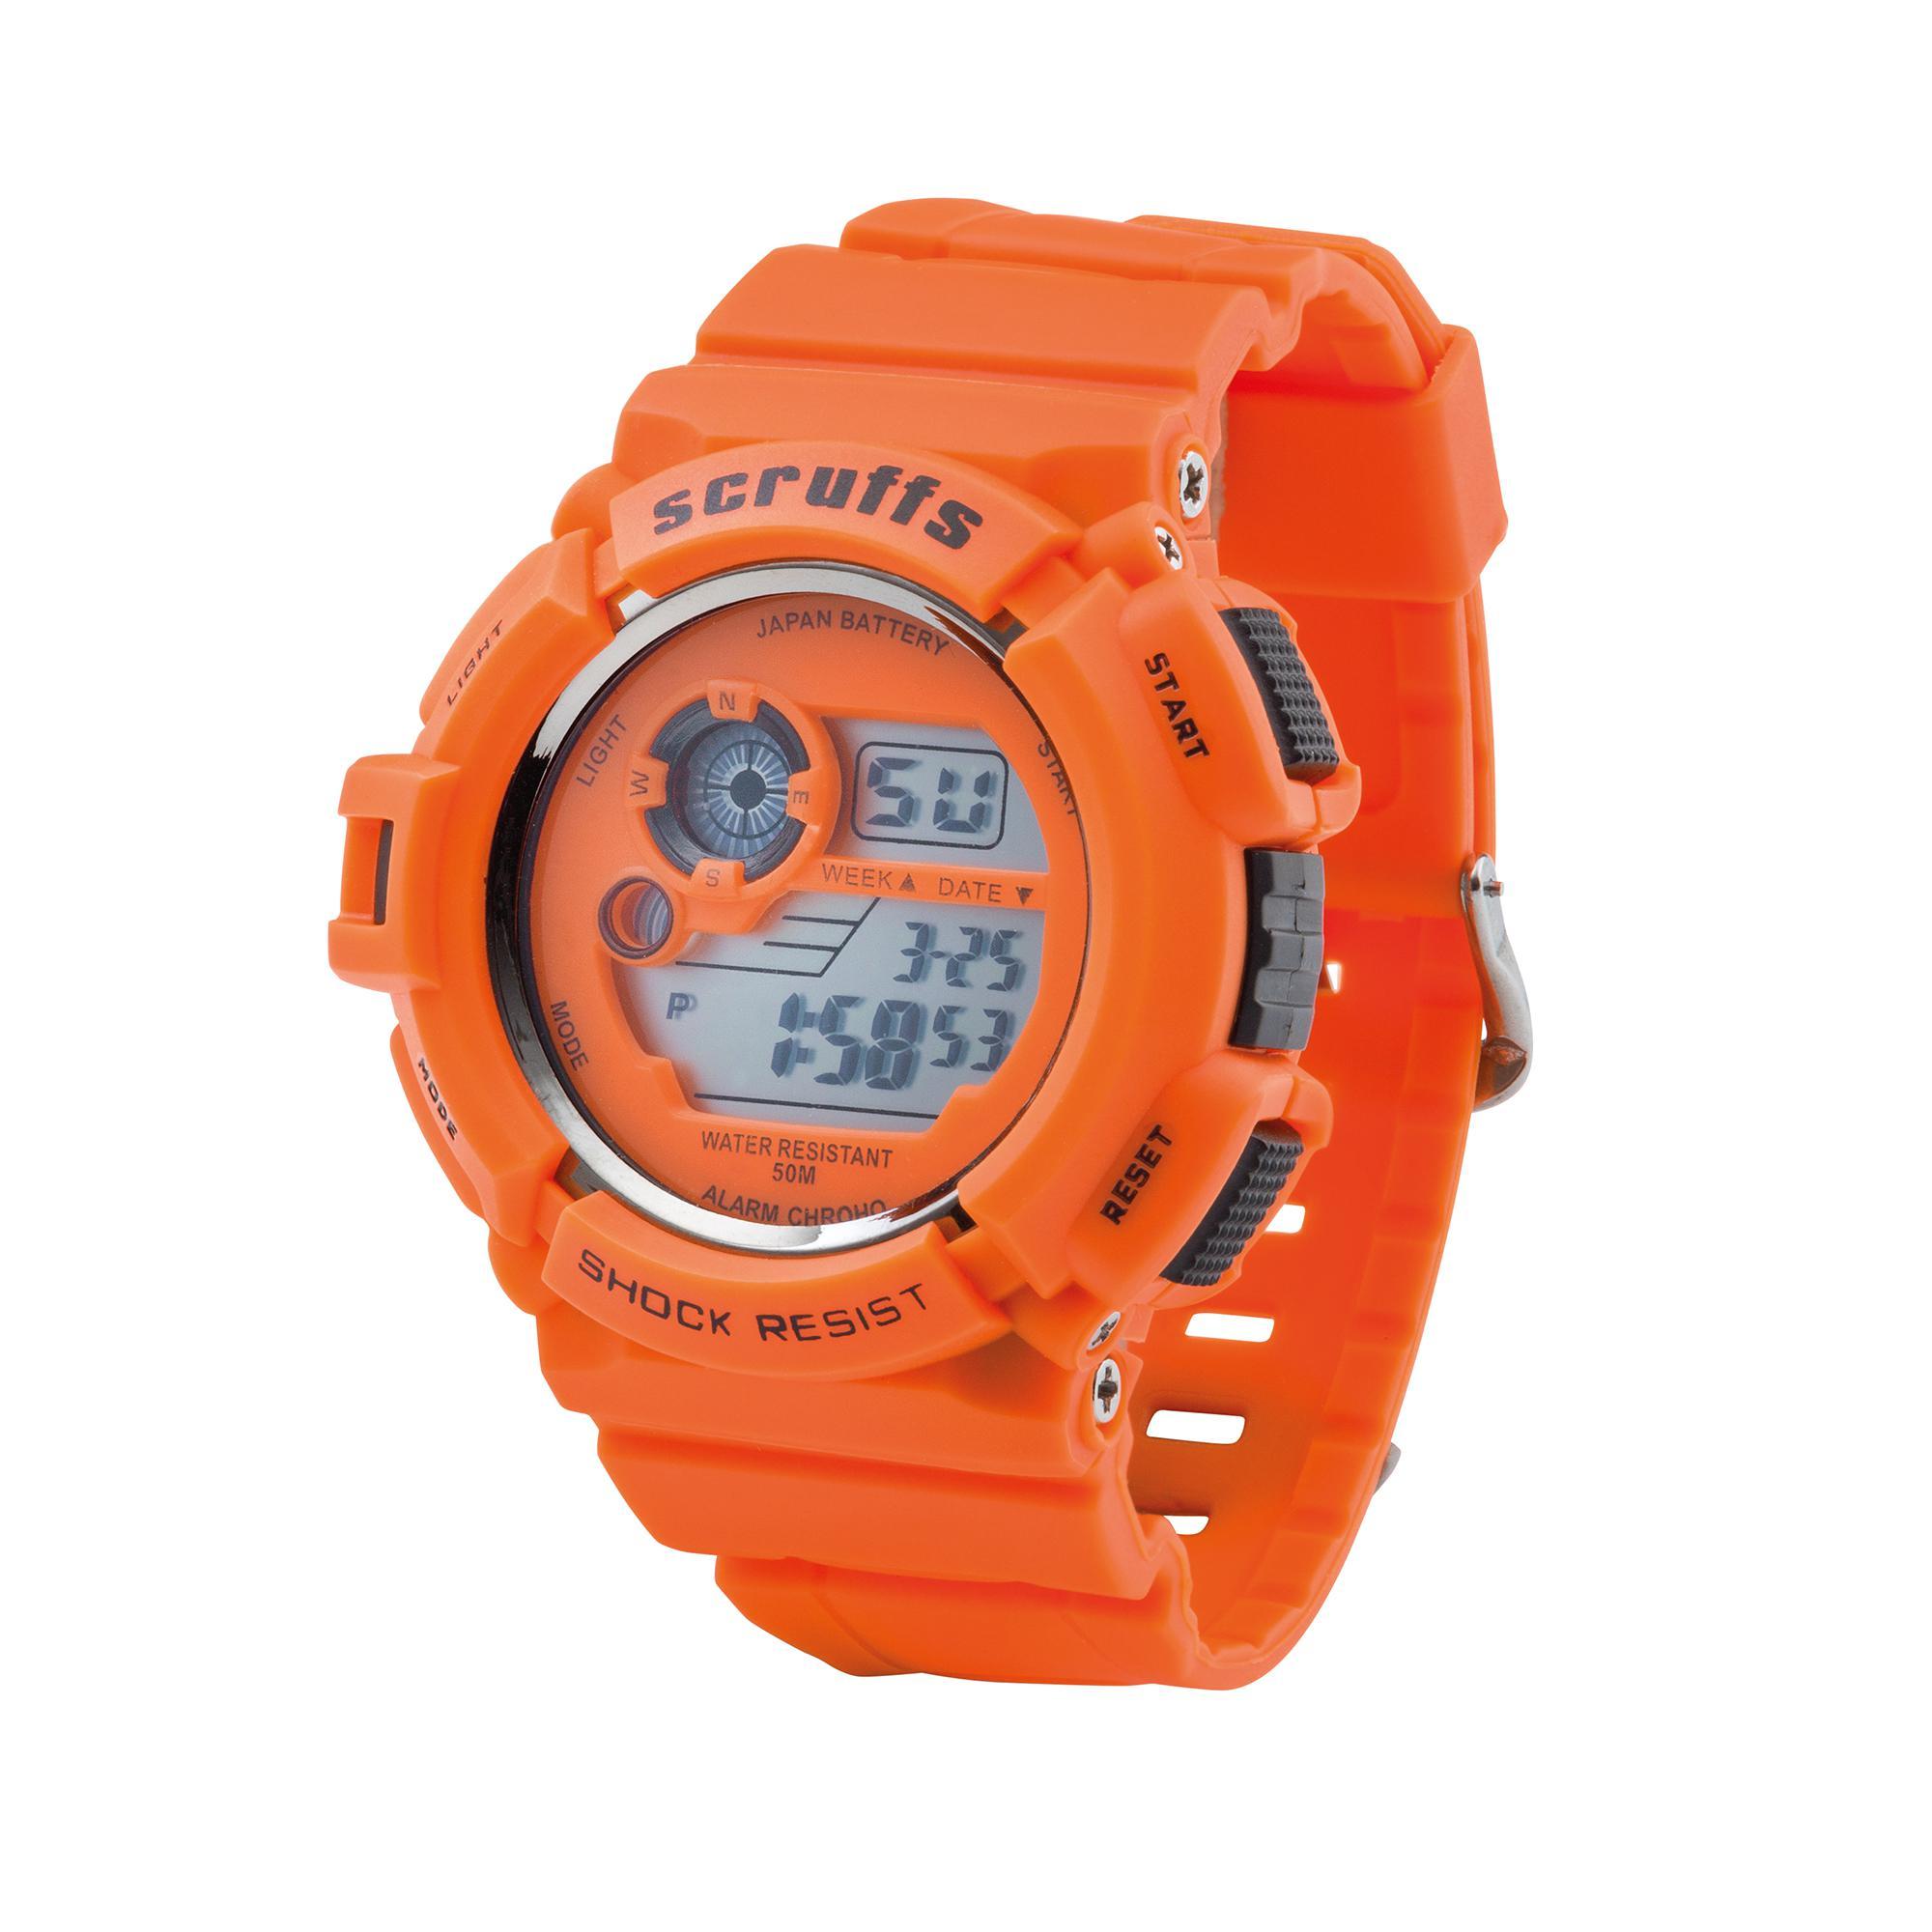 Scruffs Orange Watch